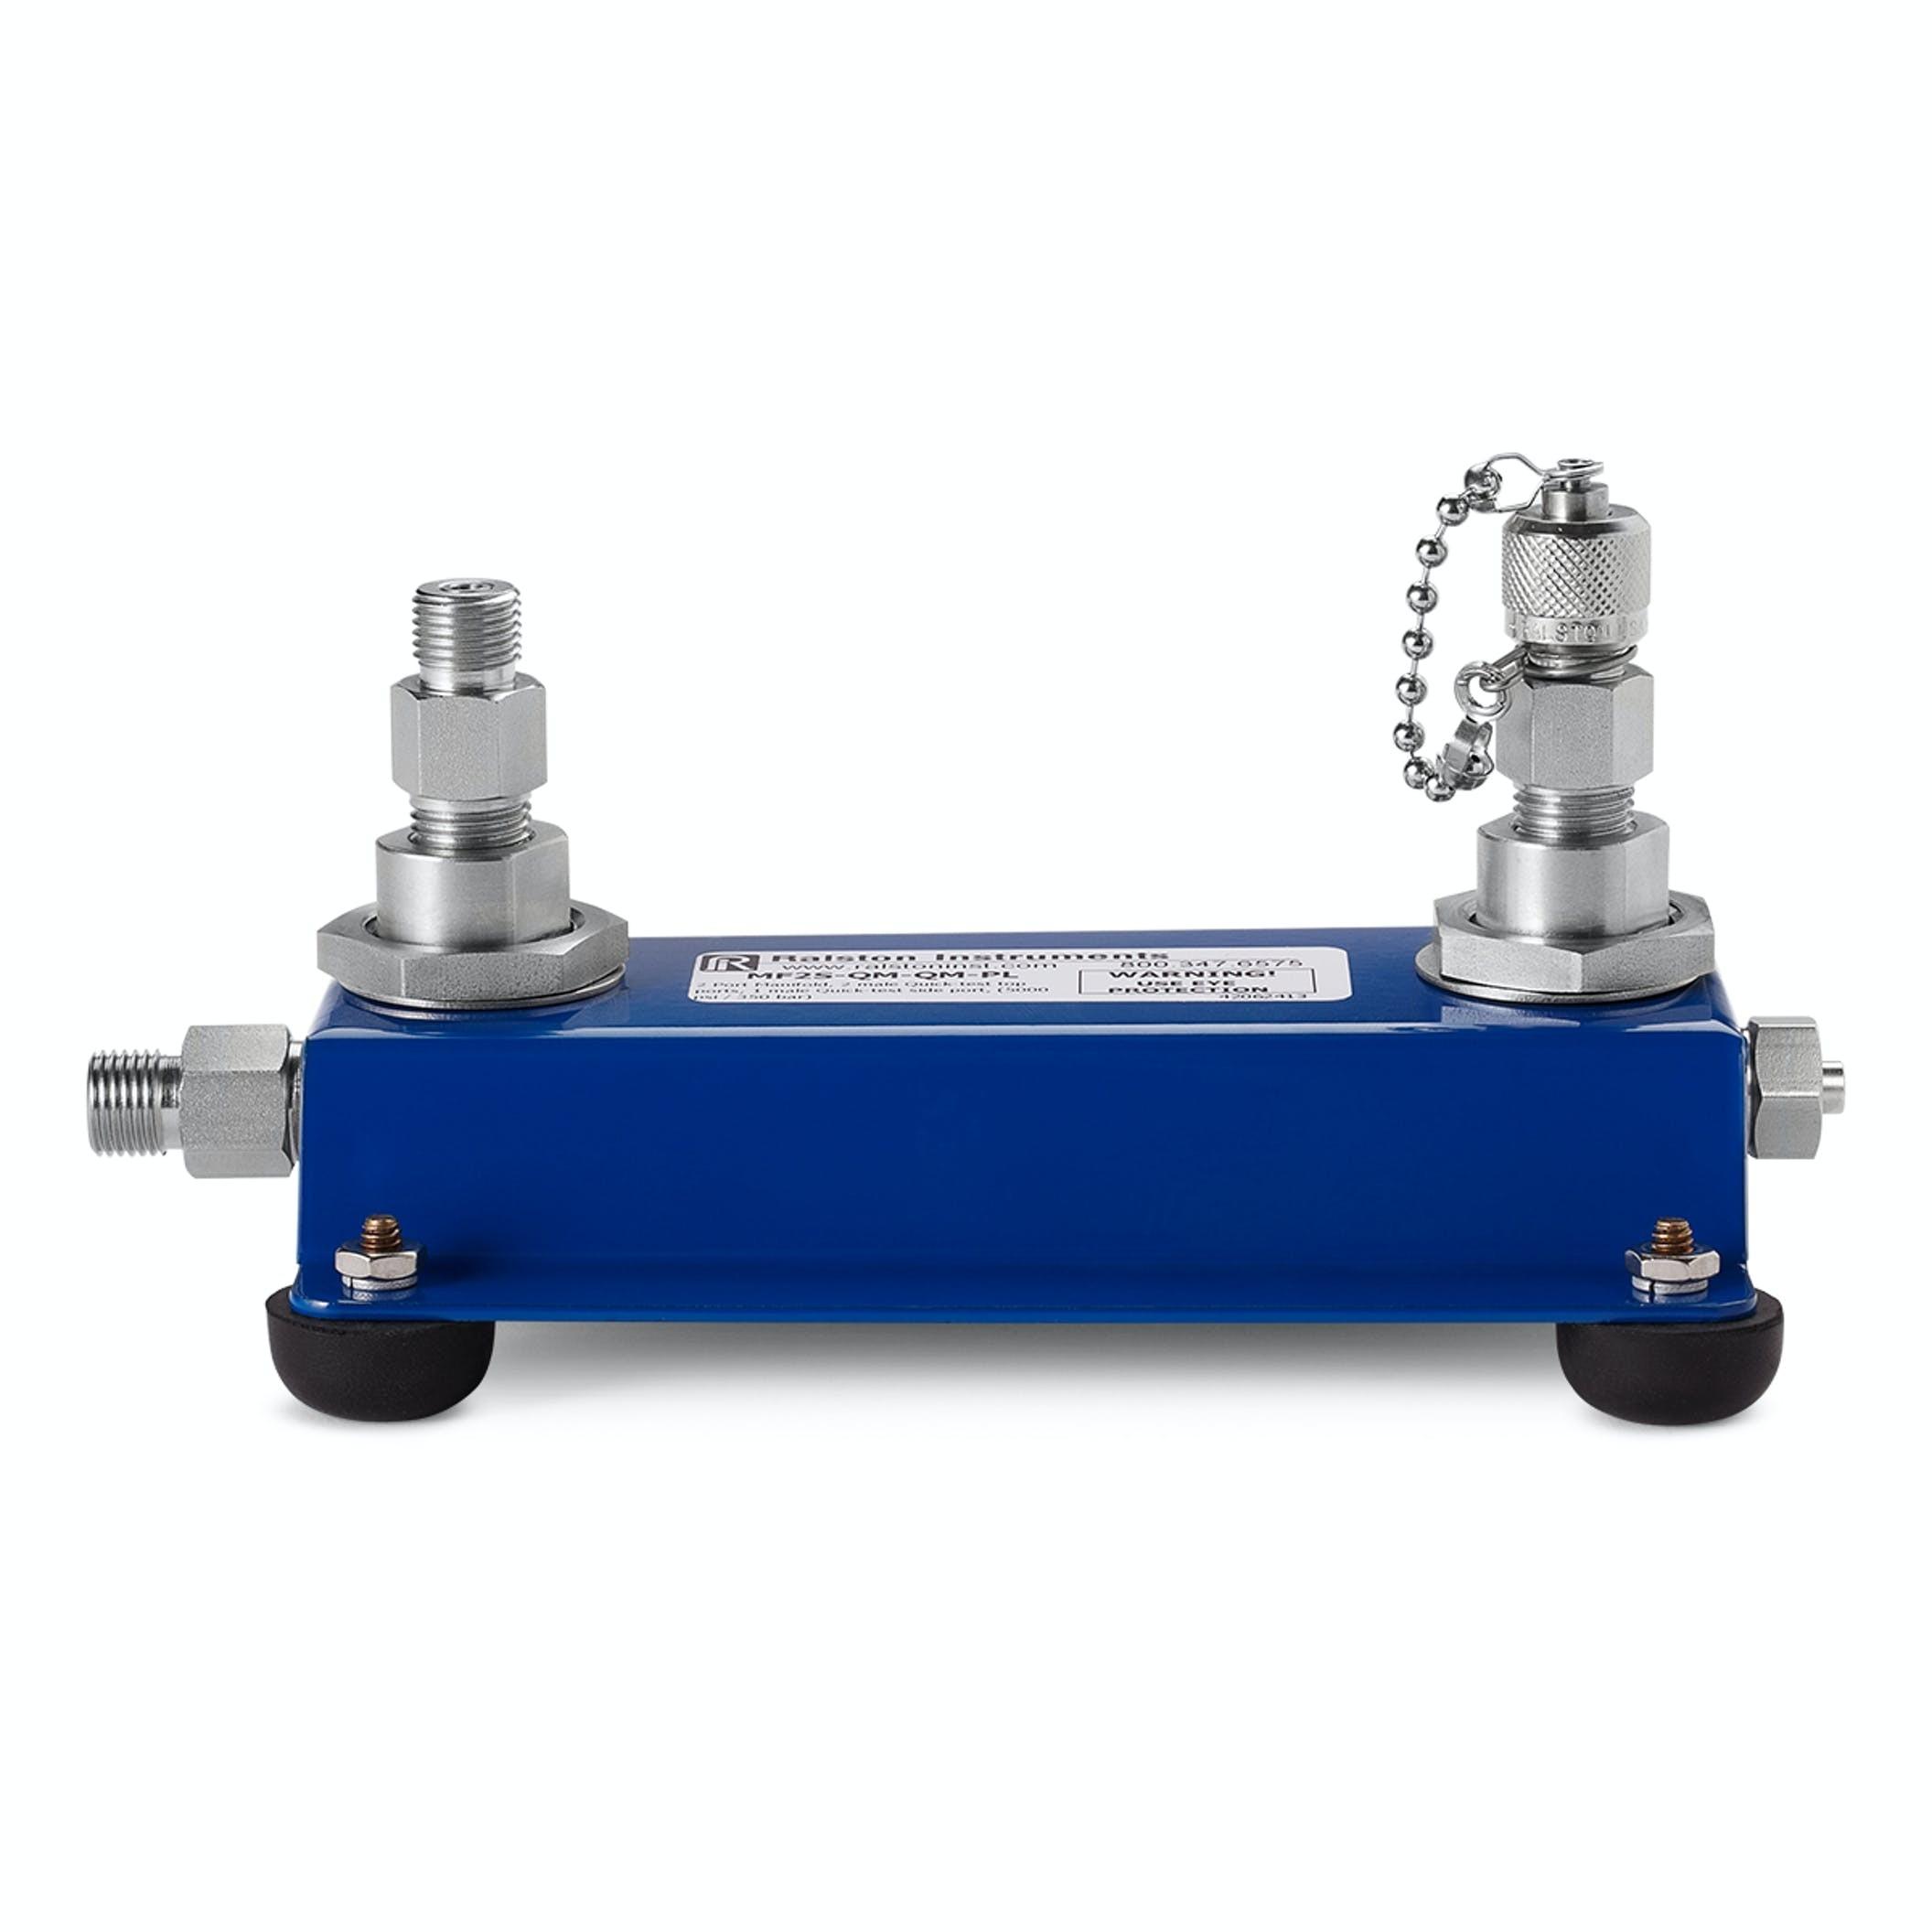 Ralston Dual Port Benchtop Manifold (350 bar)